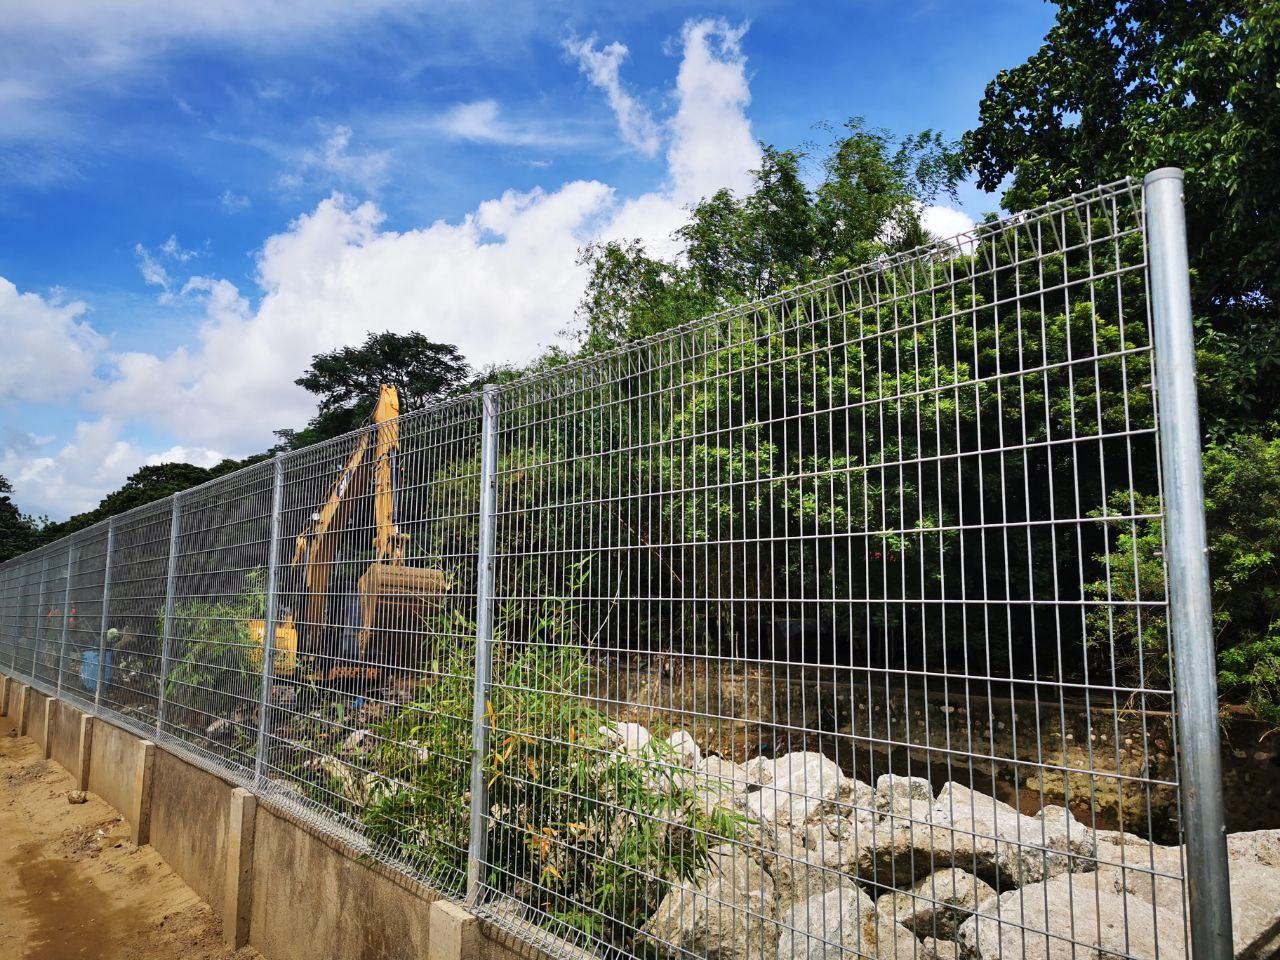 D:\2020 DESKTOP FILES\RMA NEWS\ARTICLES\ARTICLE 606 - MCCI BUTUANON\Butuanon Eco-Fence.jpeg